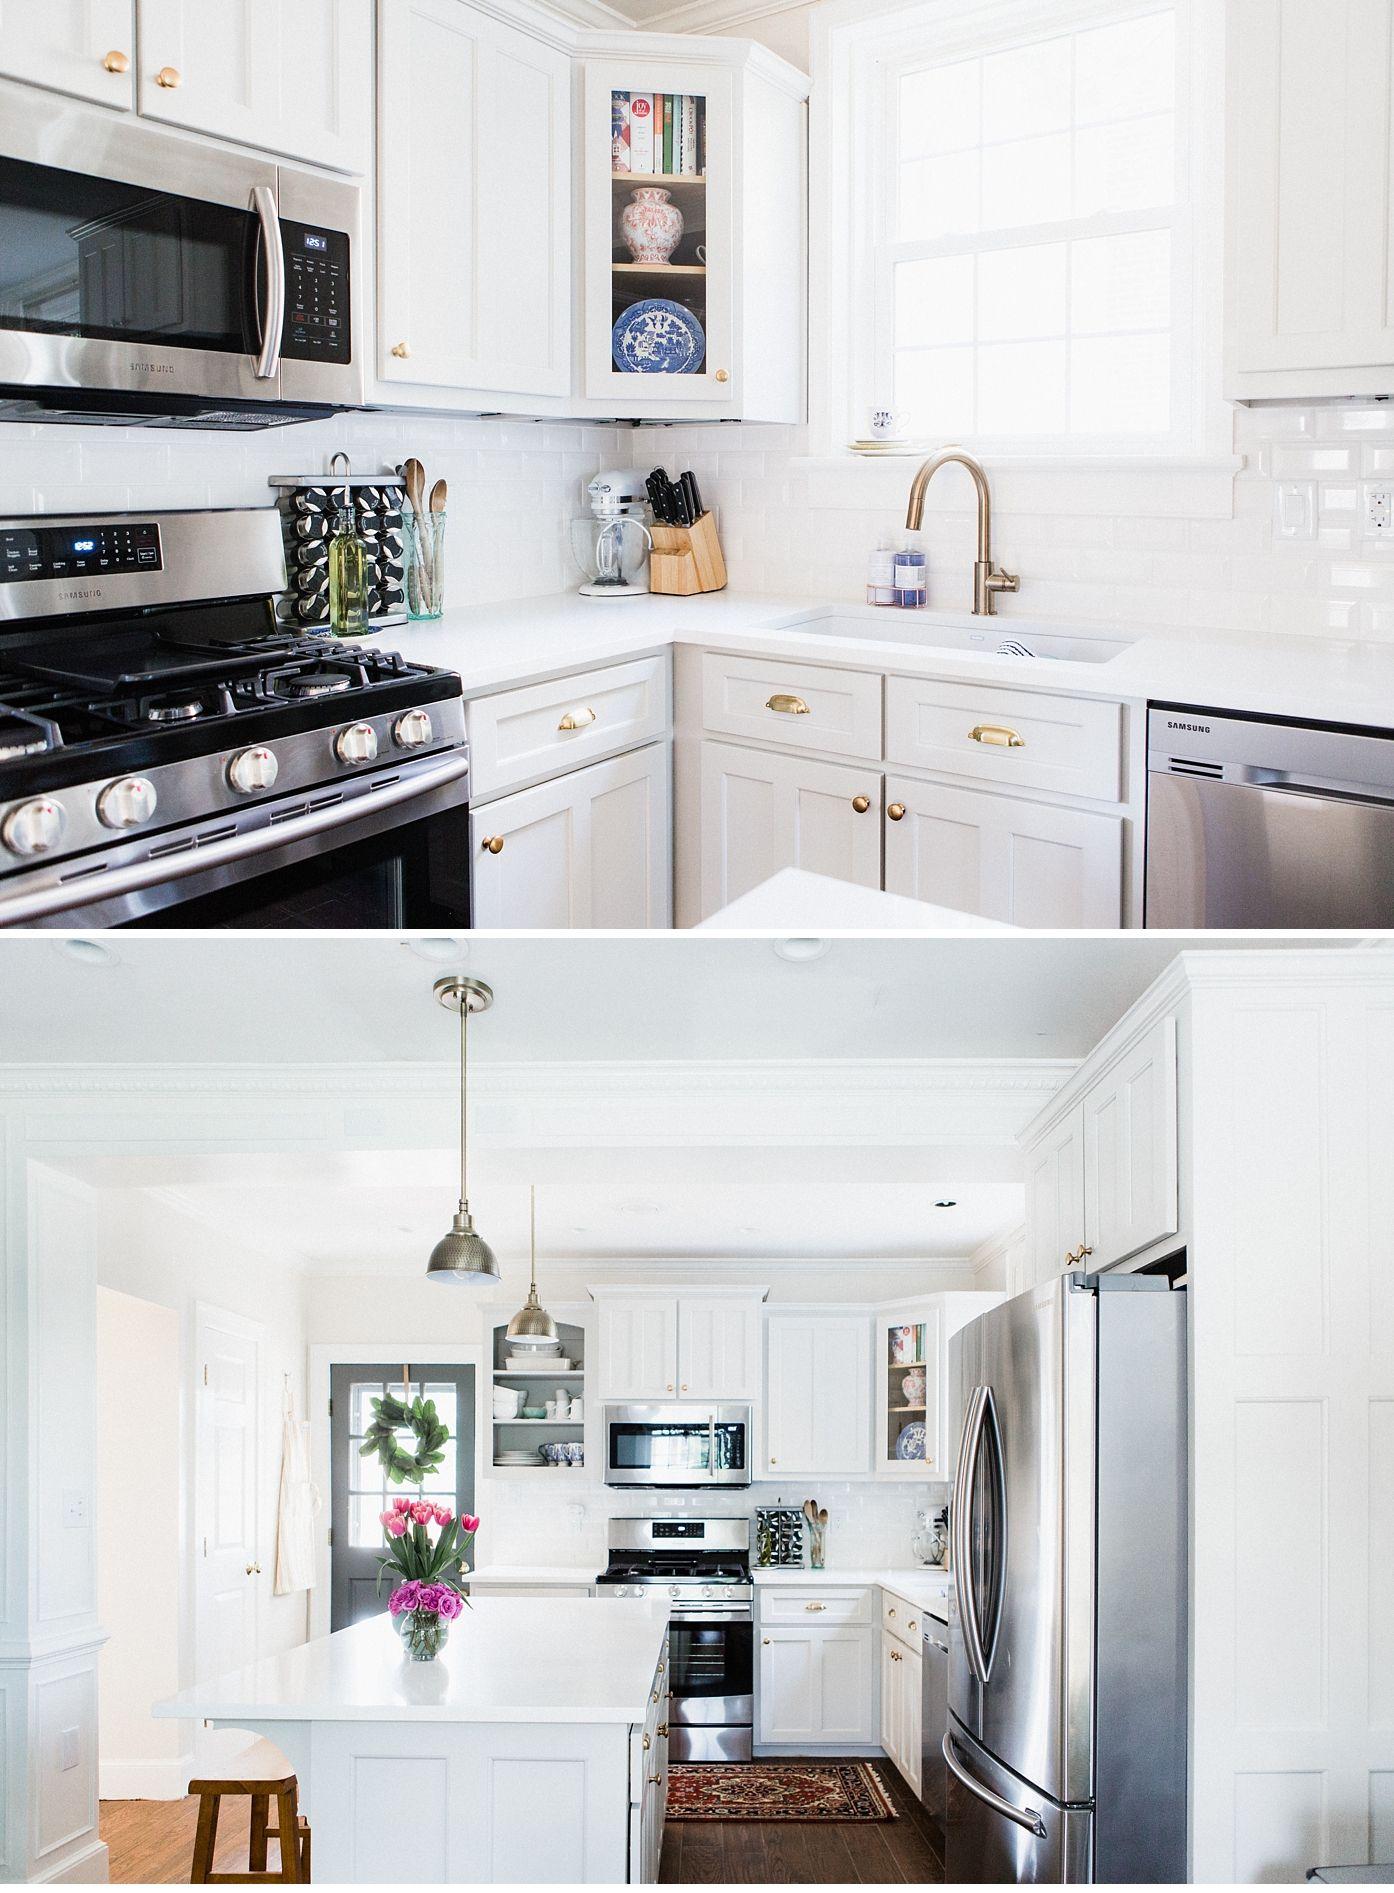 Rva Kitchen Renovation Photo By Alisandra Photography Kitchen Remodel Kitchen Design Small Best Kitchen Cabinets